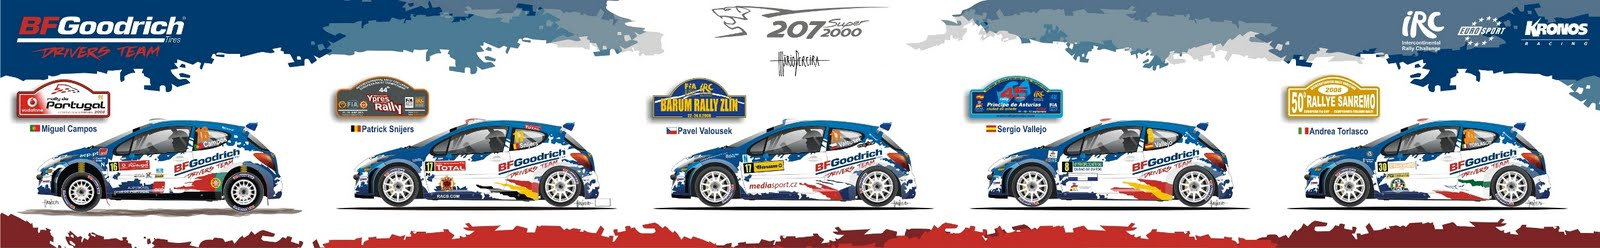 [BFGoodrich+Drivers+Team+2008_small.jpg]